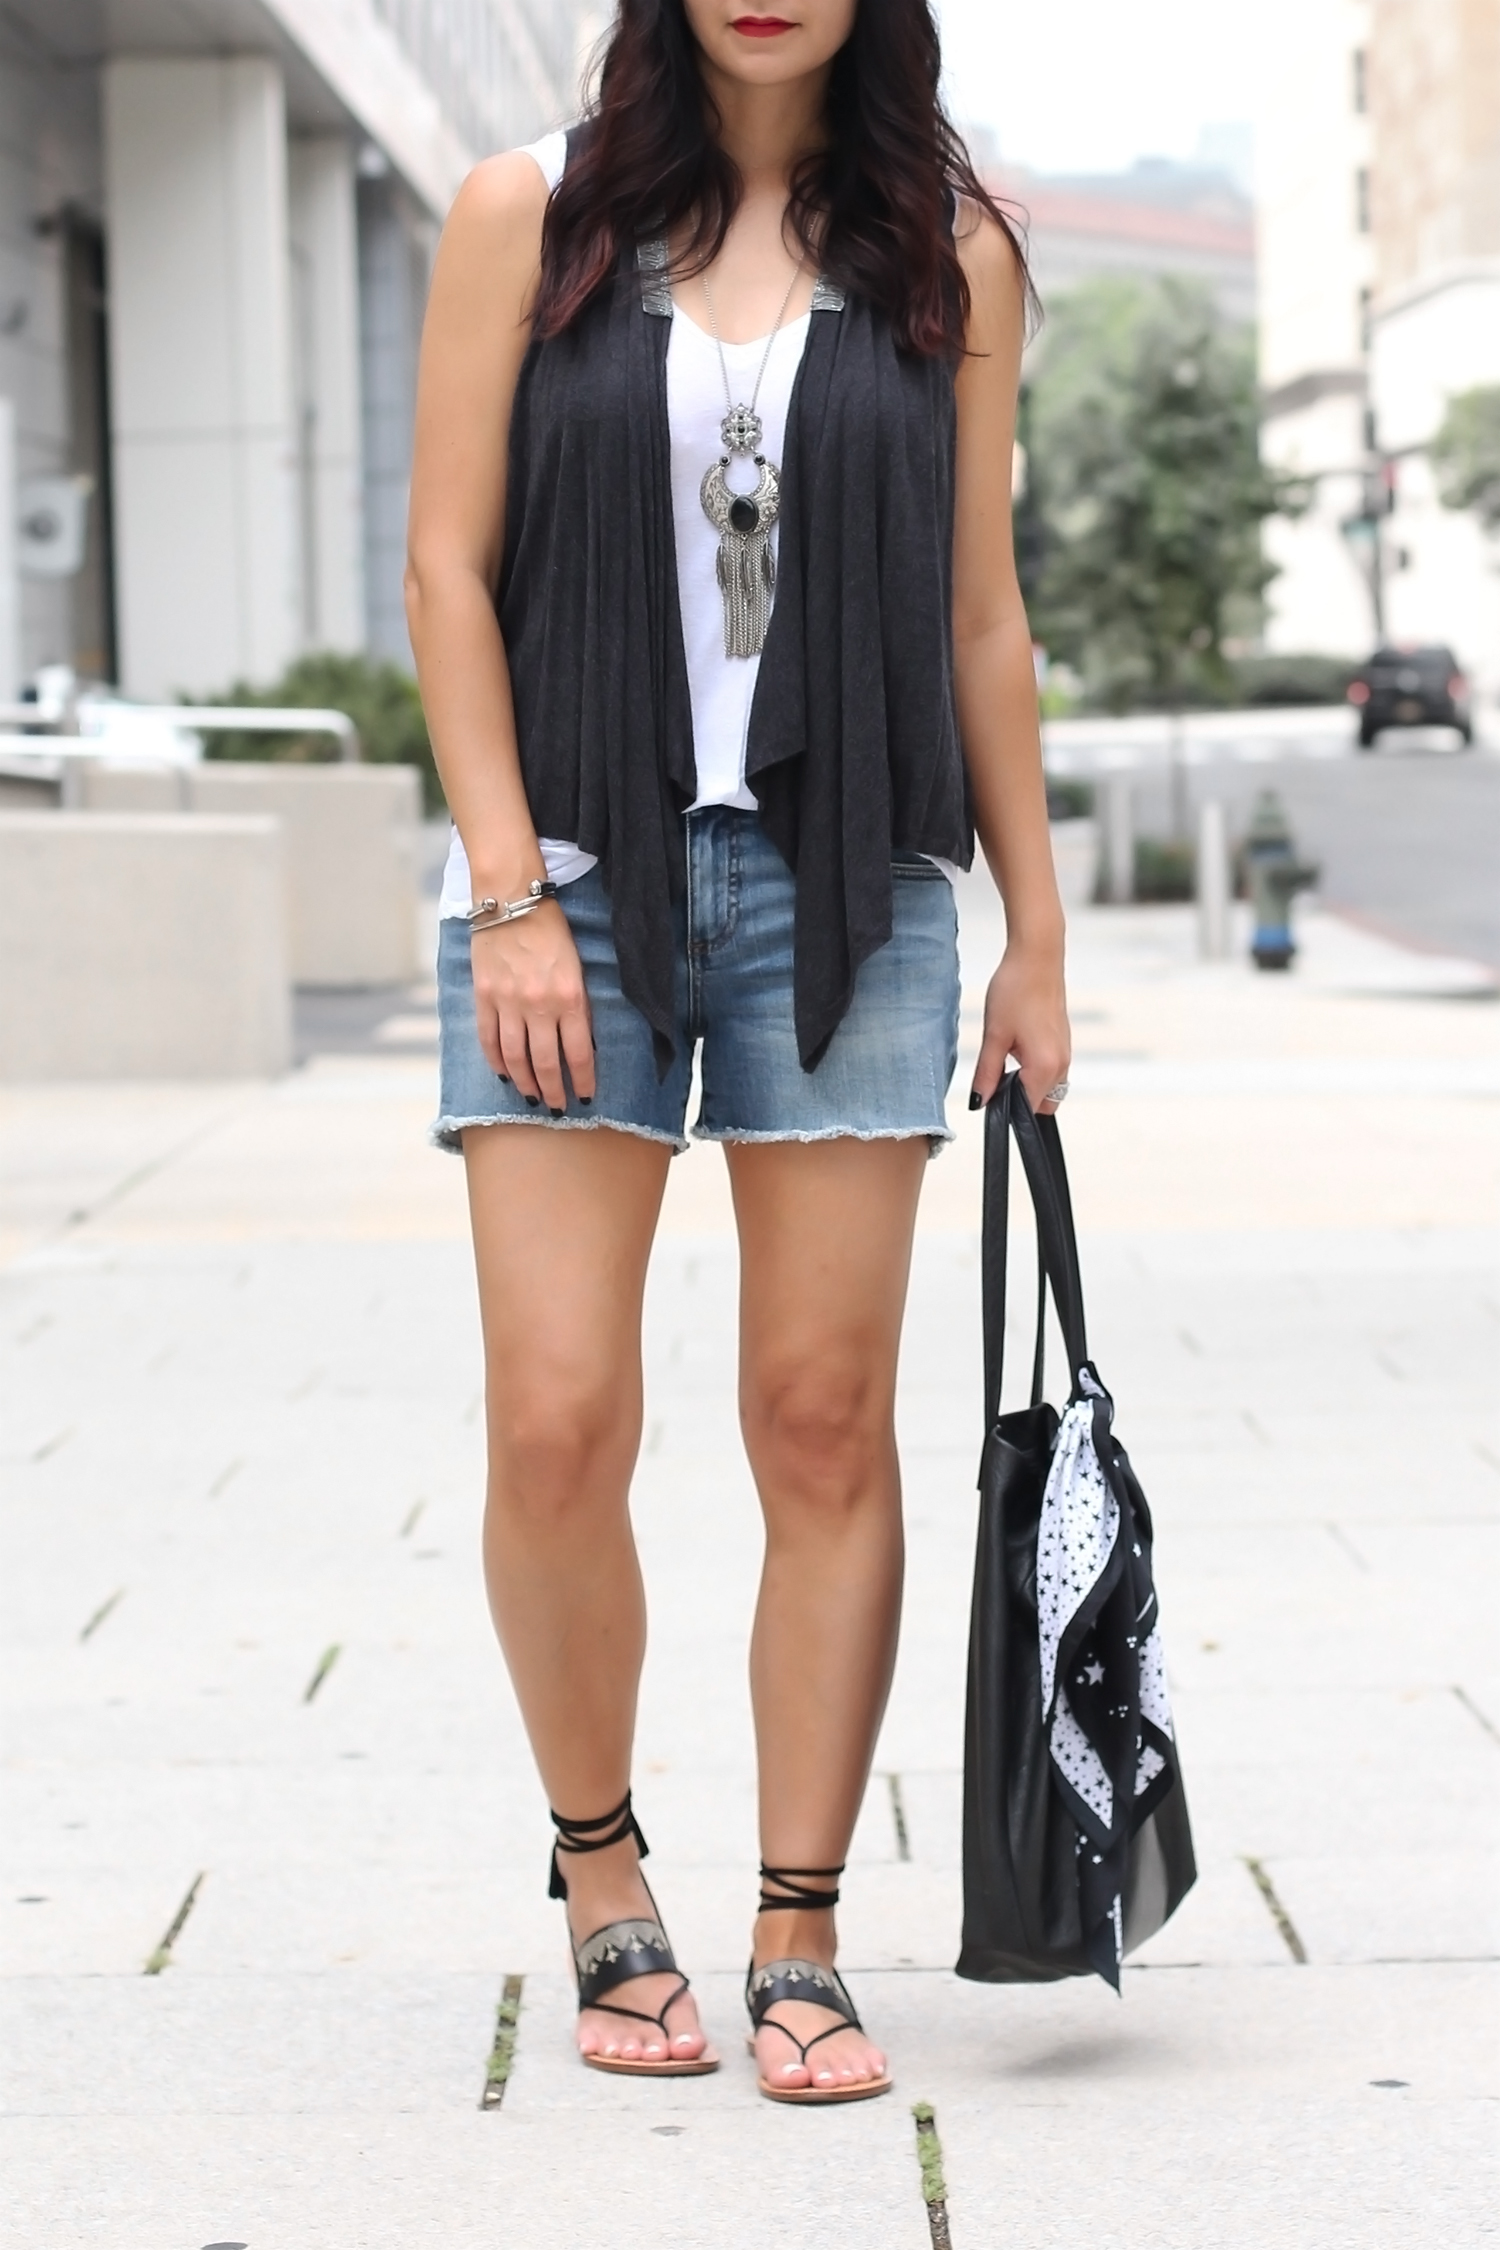 Denim Shorts Outfit, Lace Up Sandals